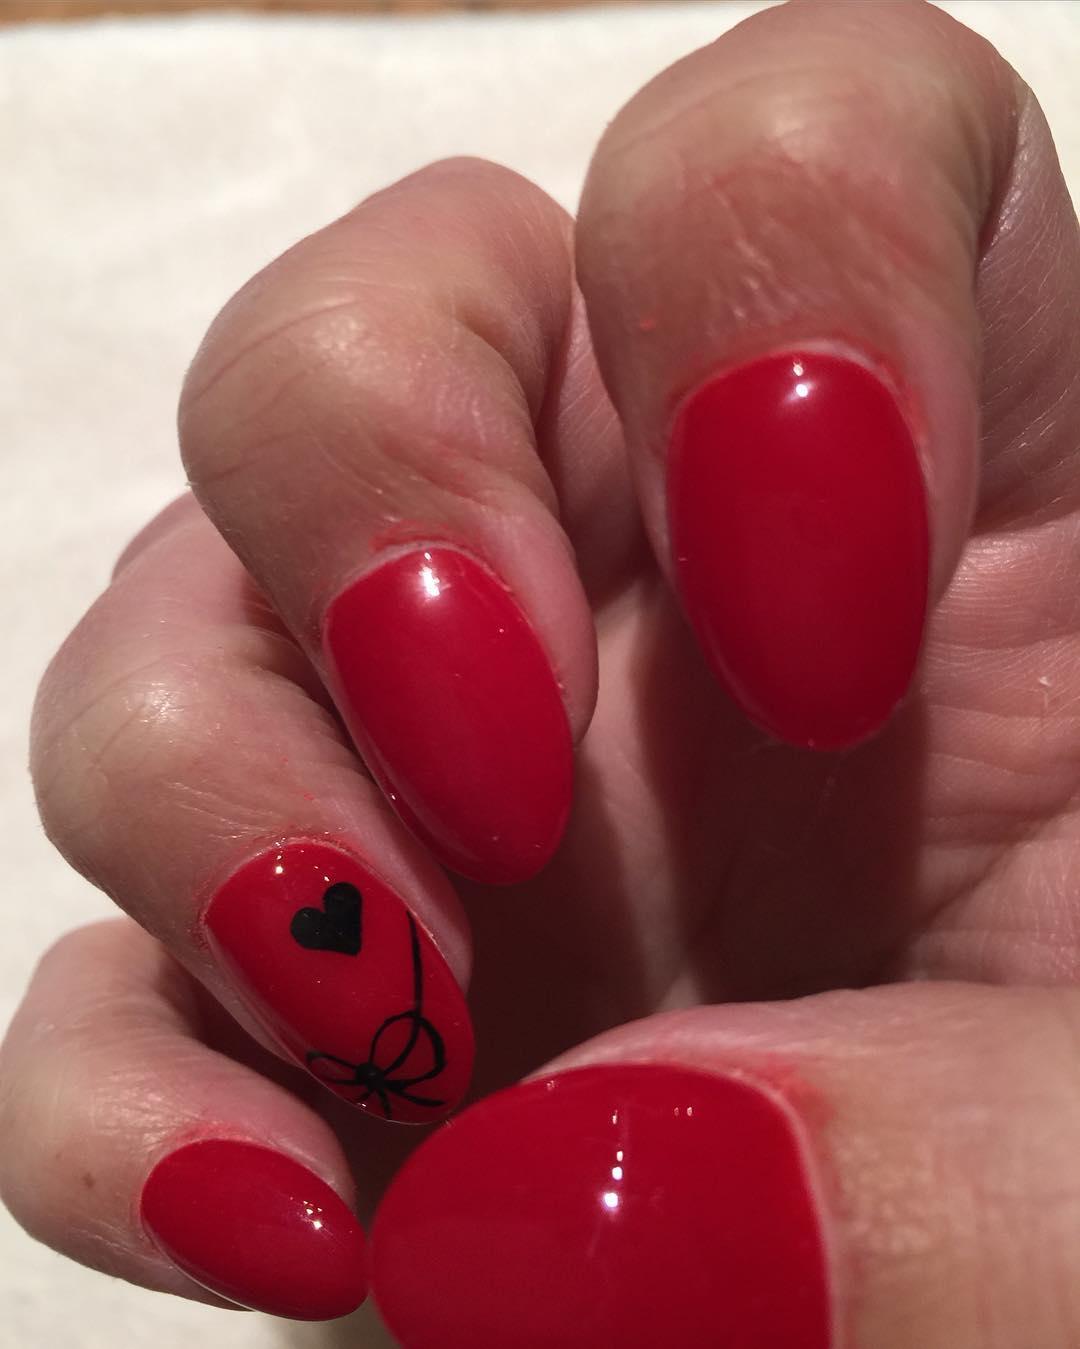 Black Ribbon Design On Summer Acrylic Nails